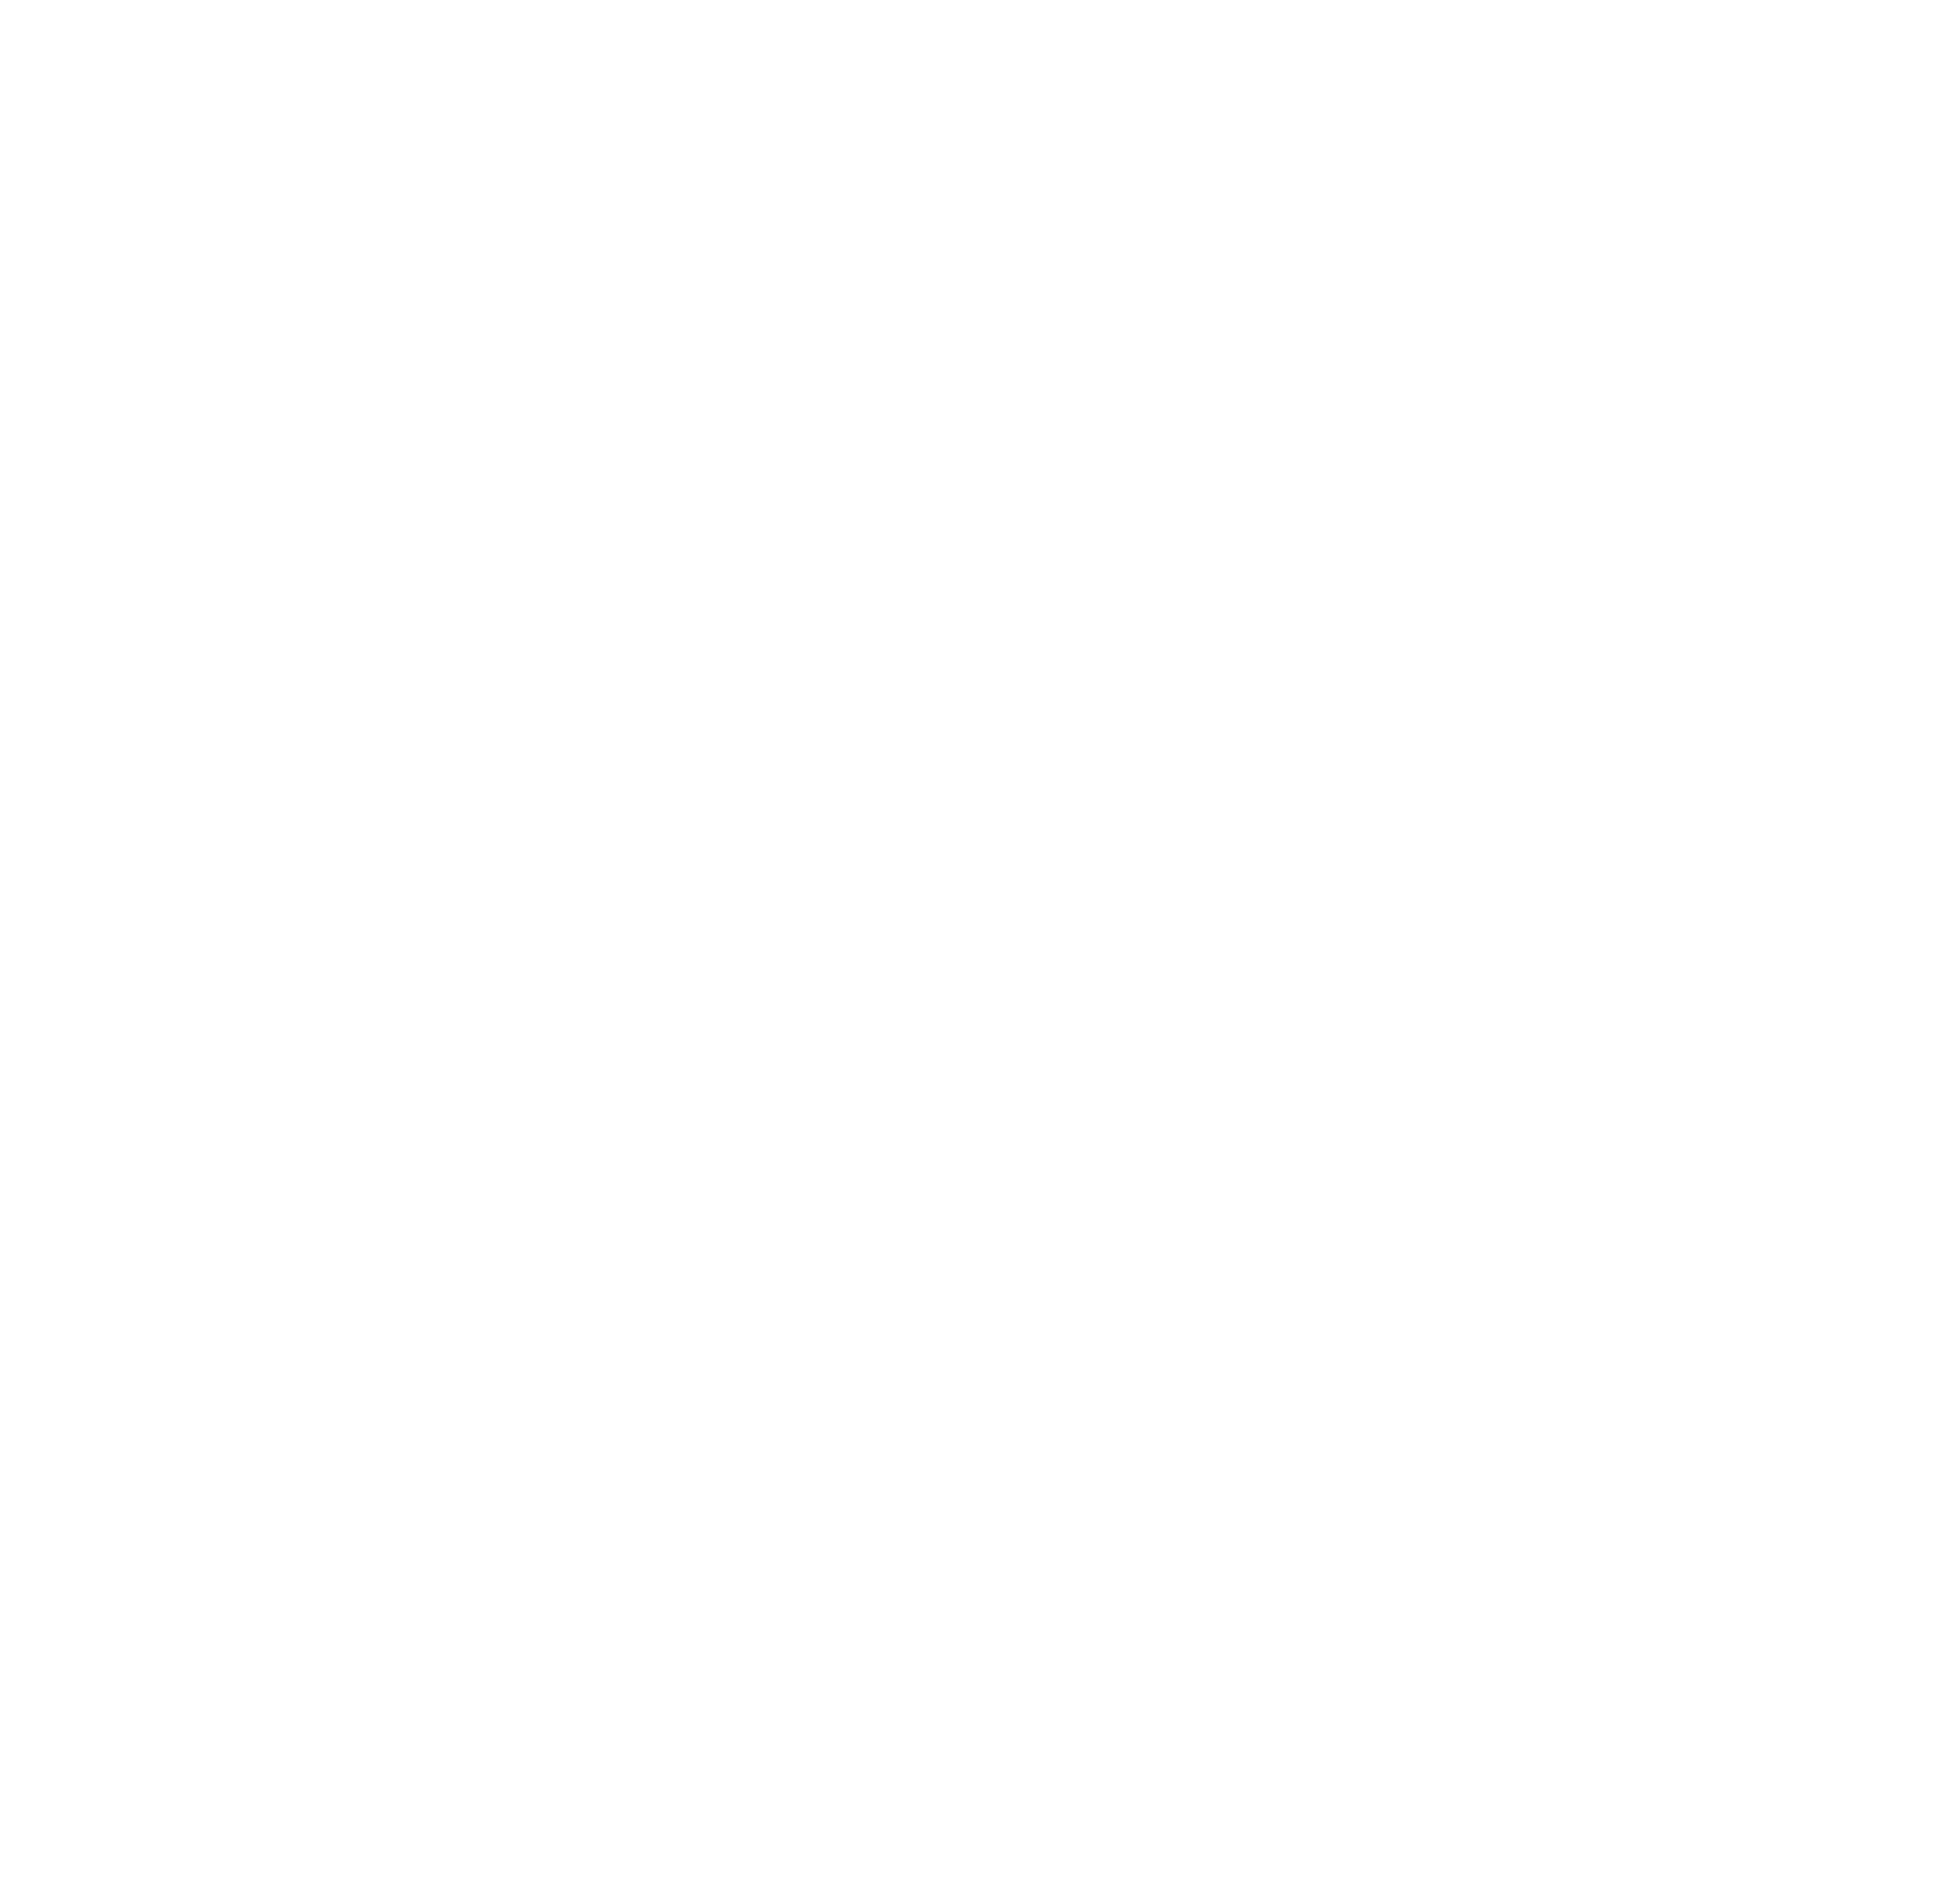 Cappai Jet Randonnée - Port Tino Rossi